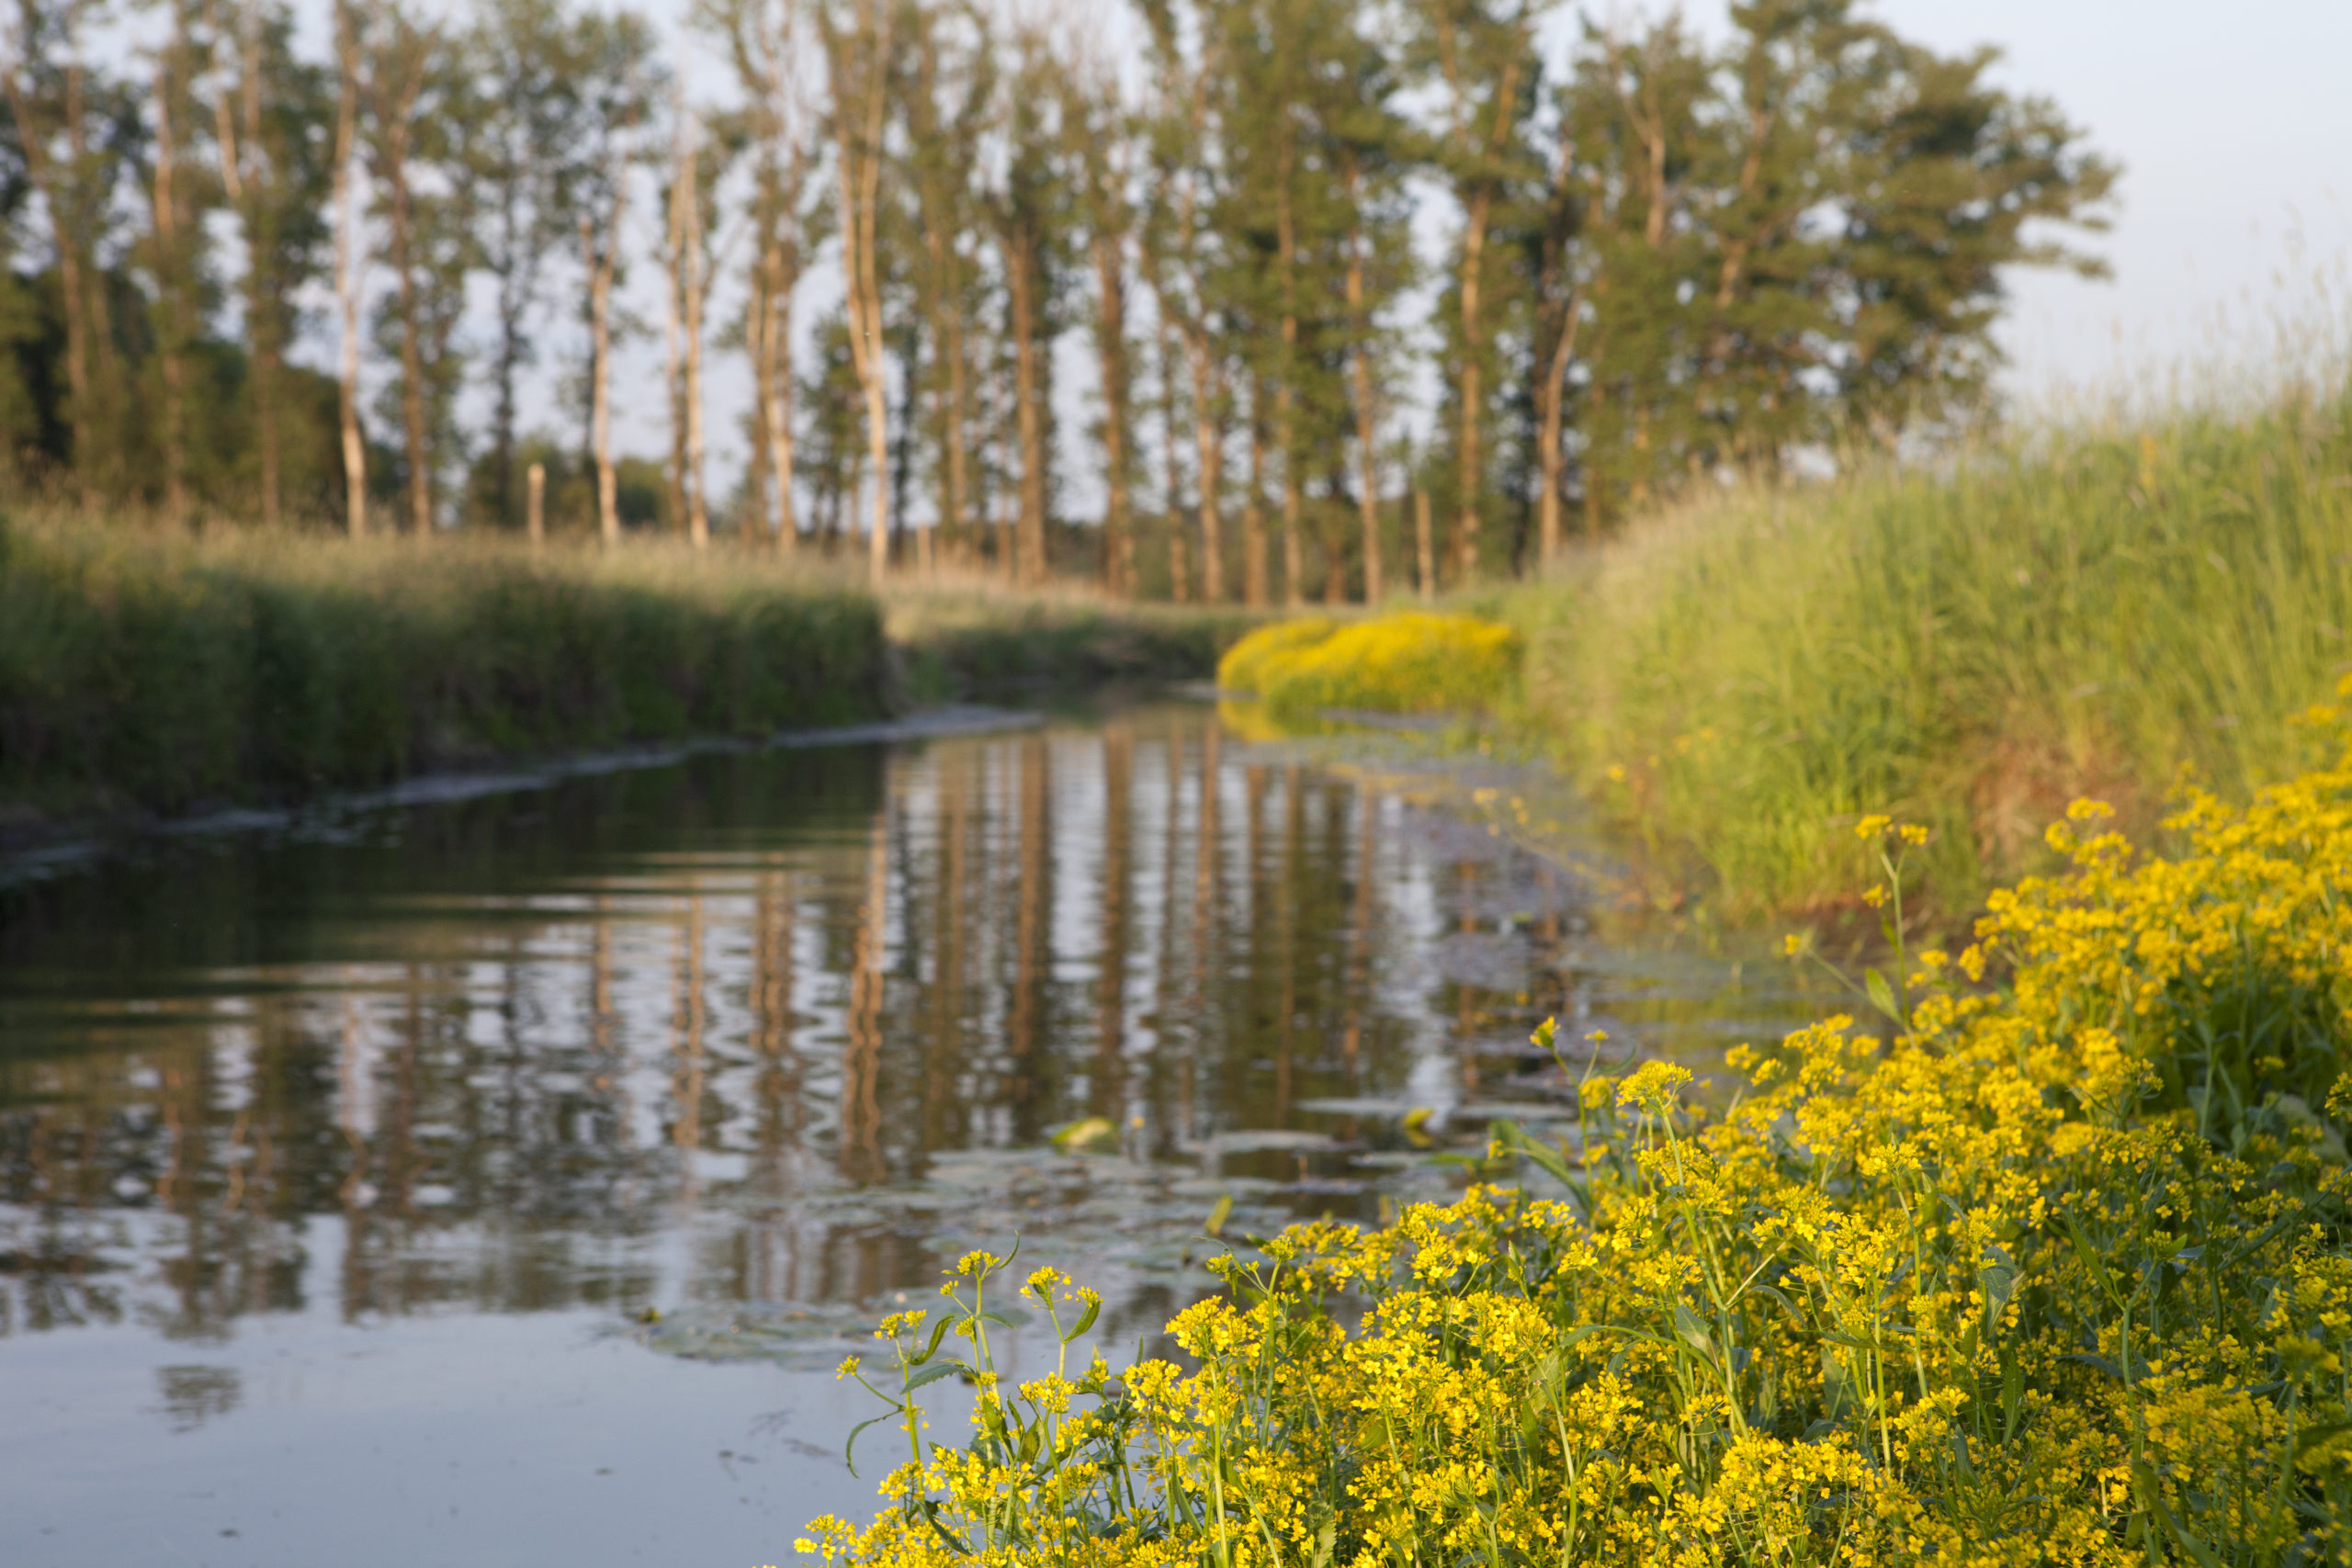 Naturlandschaft, Fluss mit Blumen am Rand